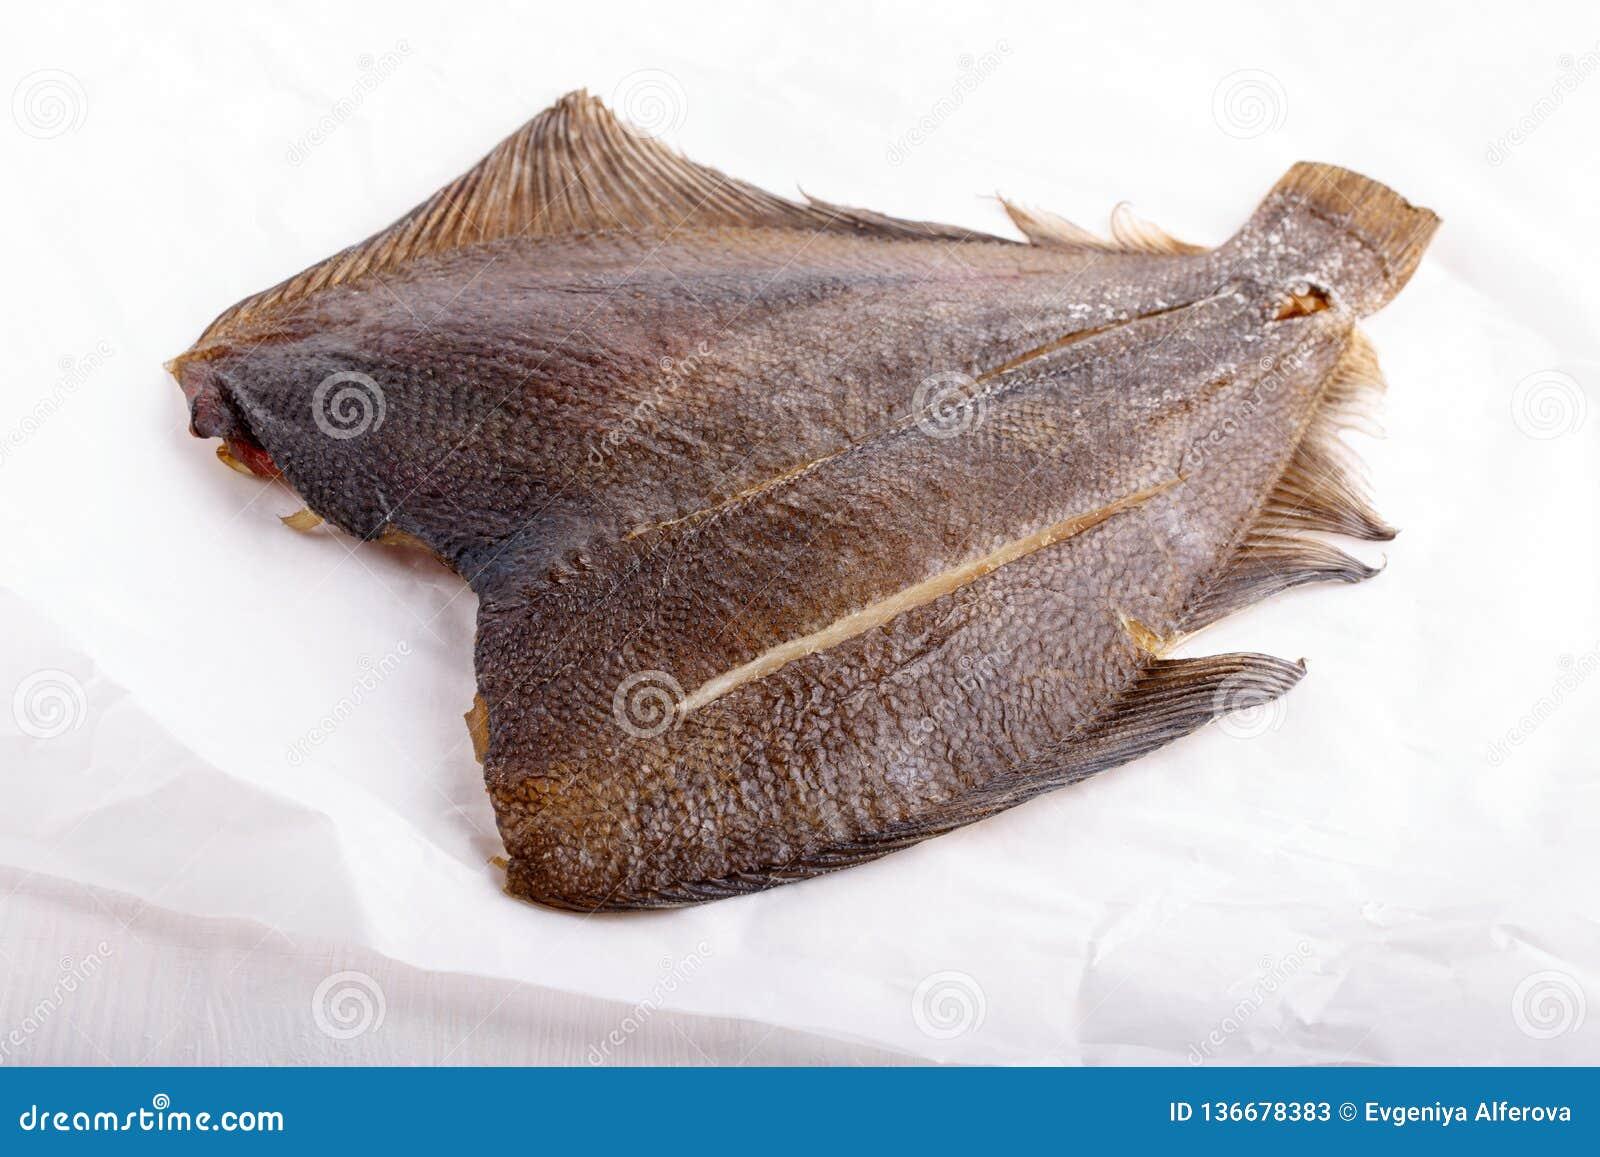 Uwędzona ryba - flądra